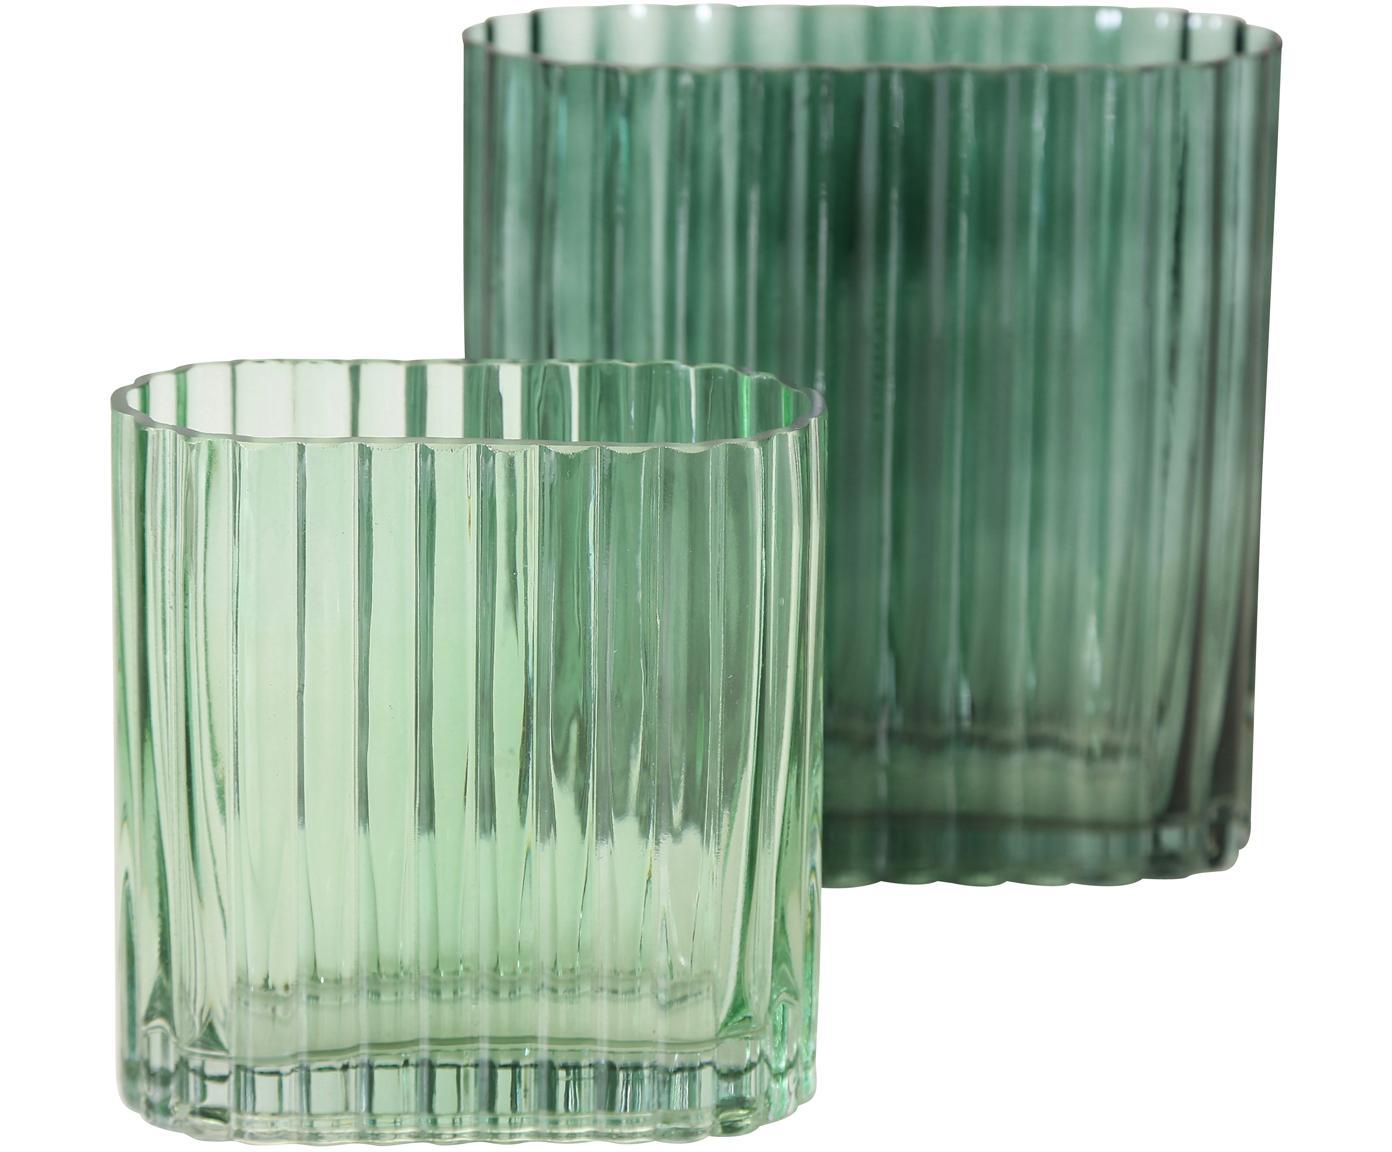 Glazen vazenset Tulipa, 2-delig, Glas, Donkergroen, Verschillende formaten